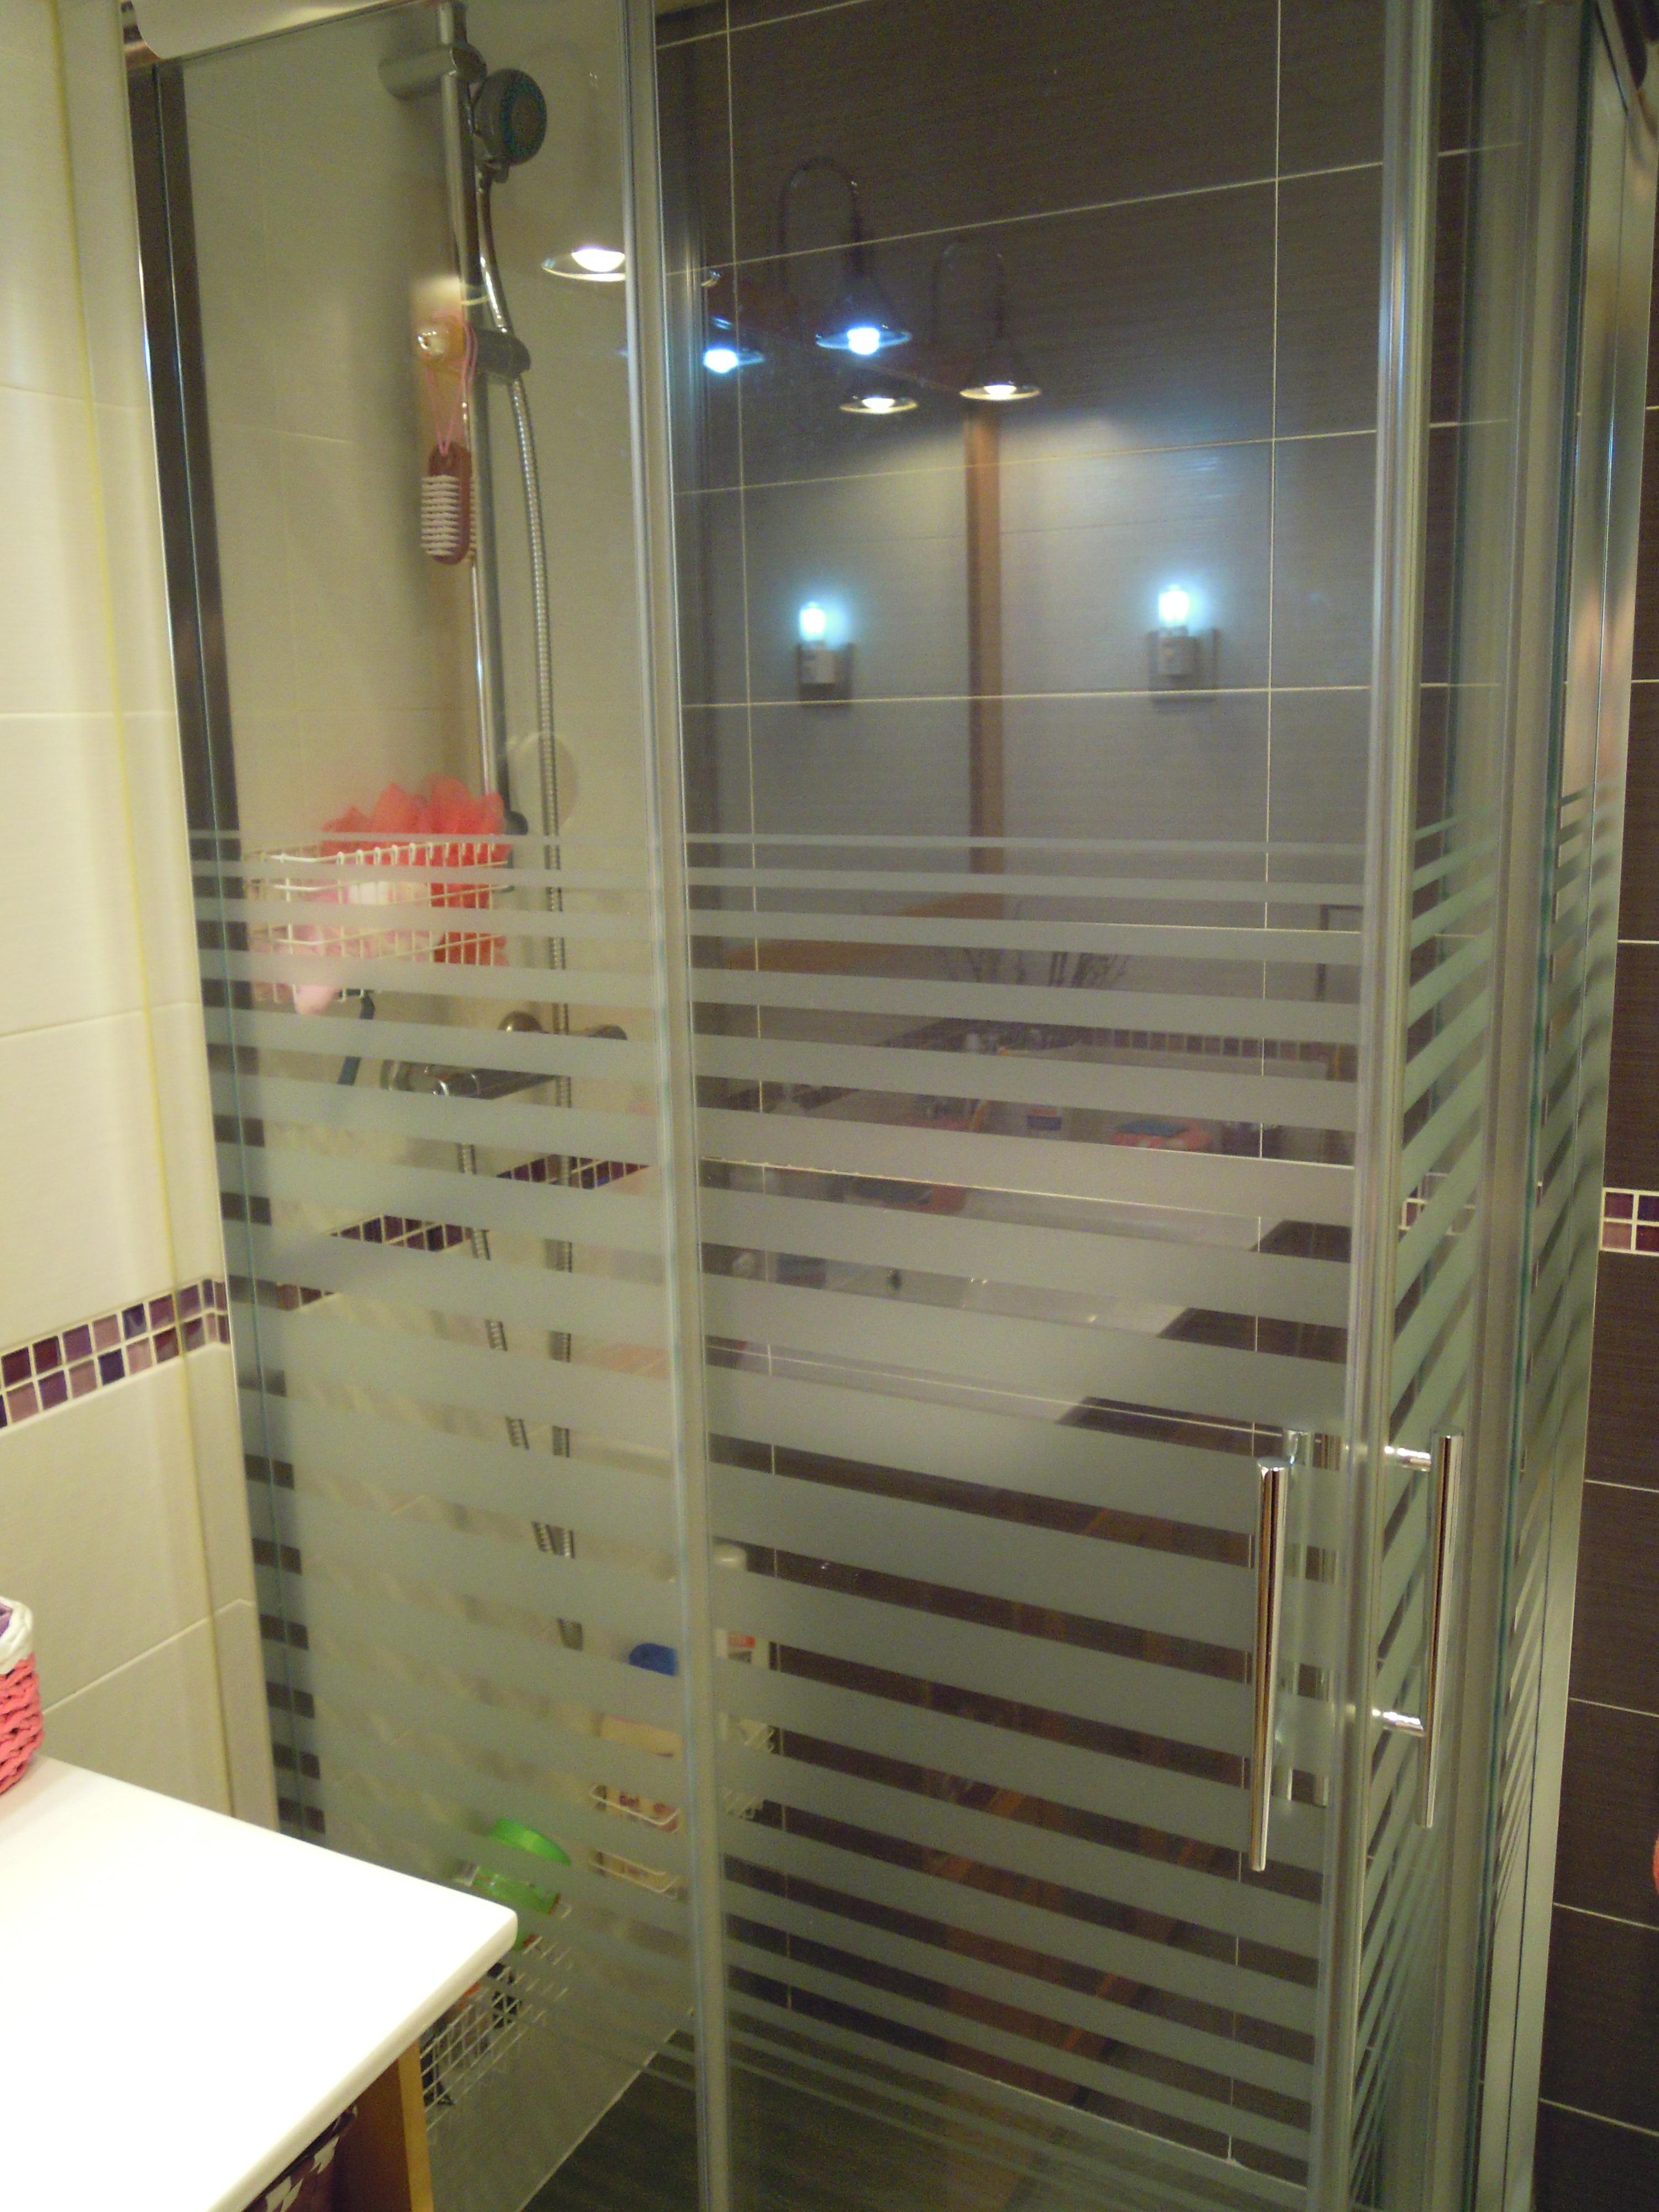 Fotos gratis piso interior habitaci n dise o de for Piso ducha bano